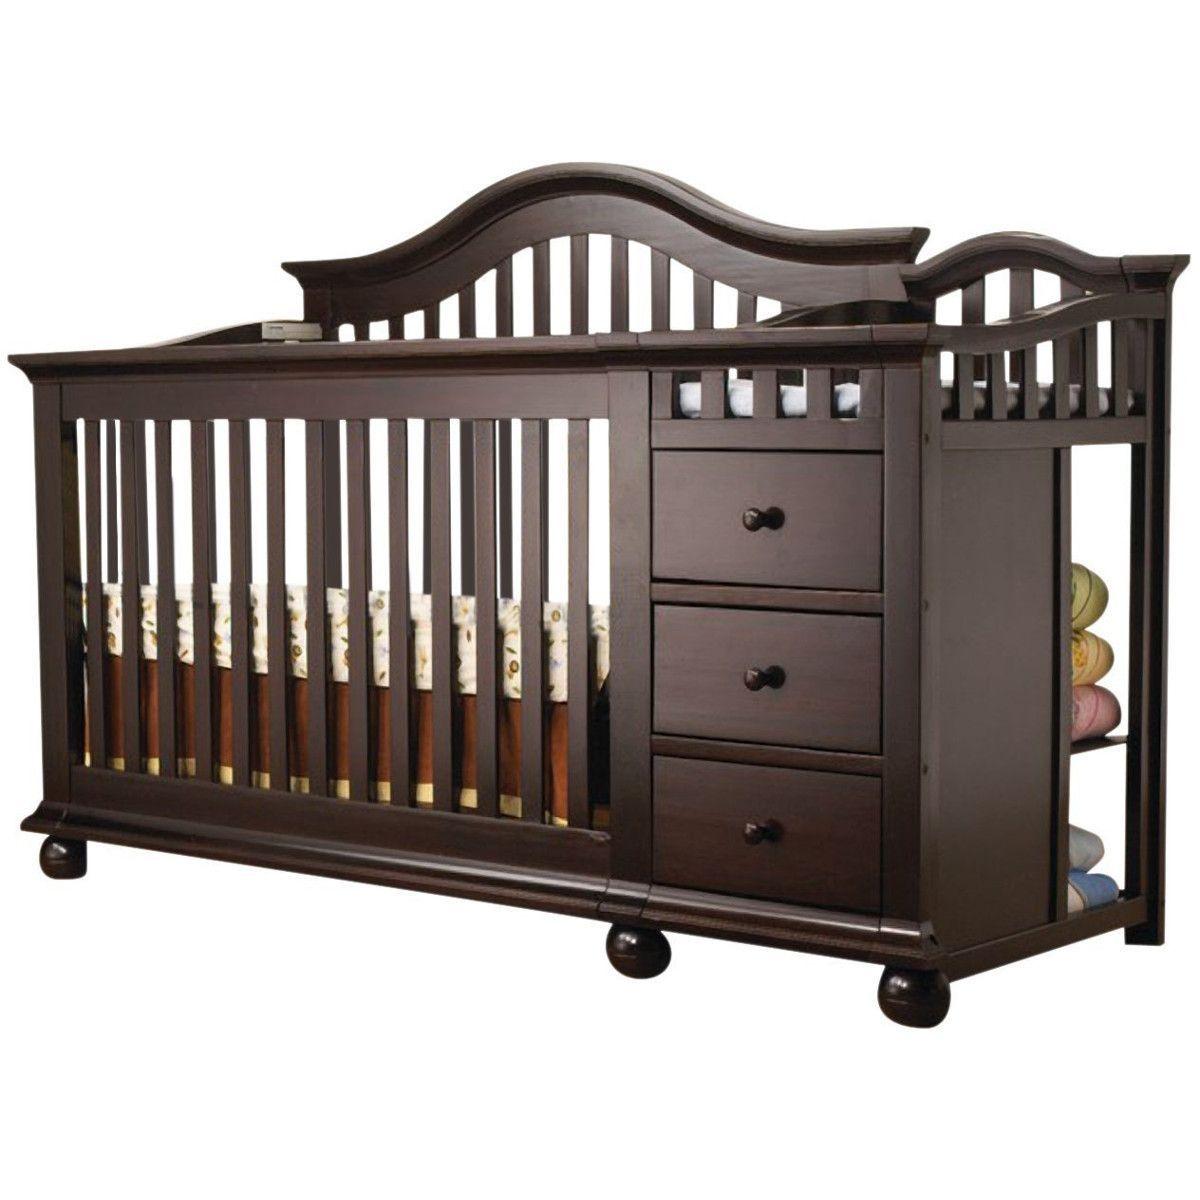 Sorelle CapeCod Crib & Changer in Espresso | Future baby things ...